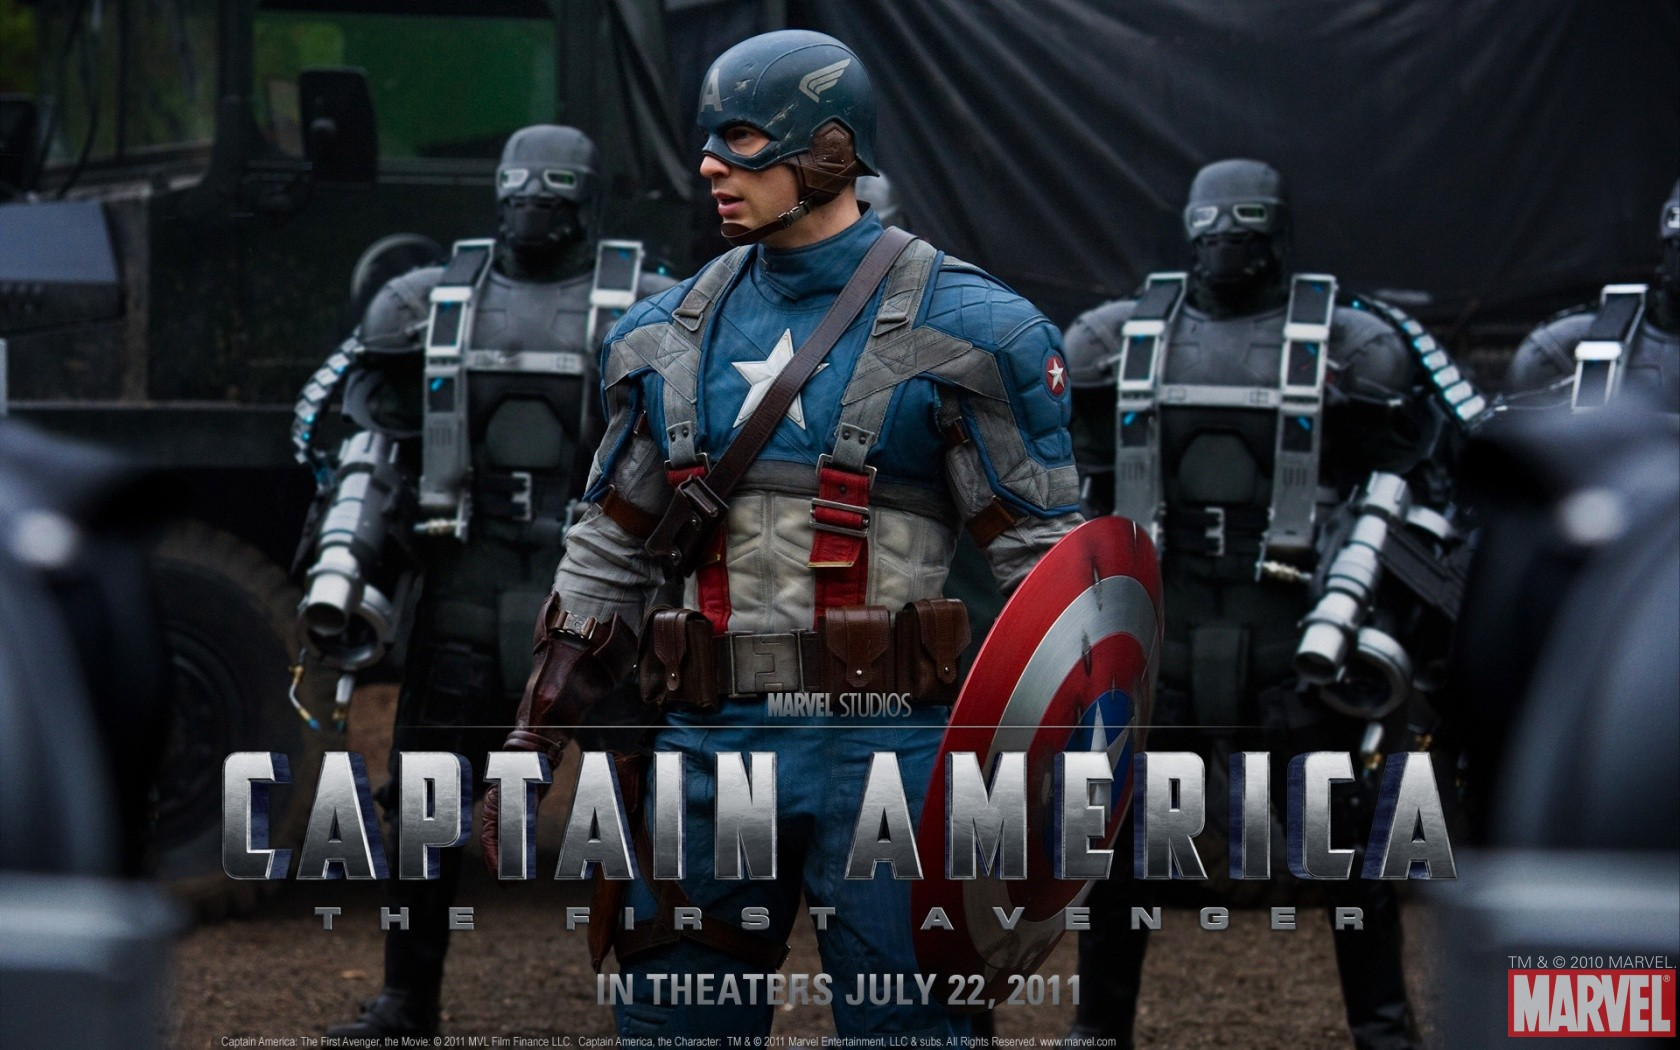 hd desktop wallpaper hd screensaver background captain america movie 1680x1050